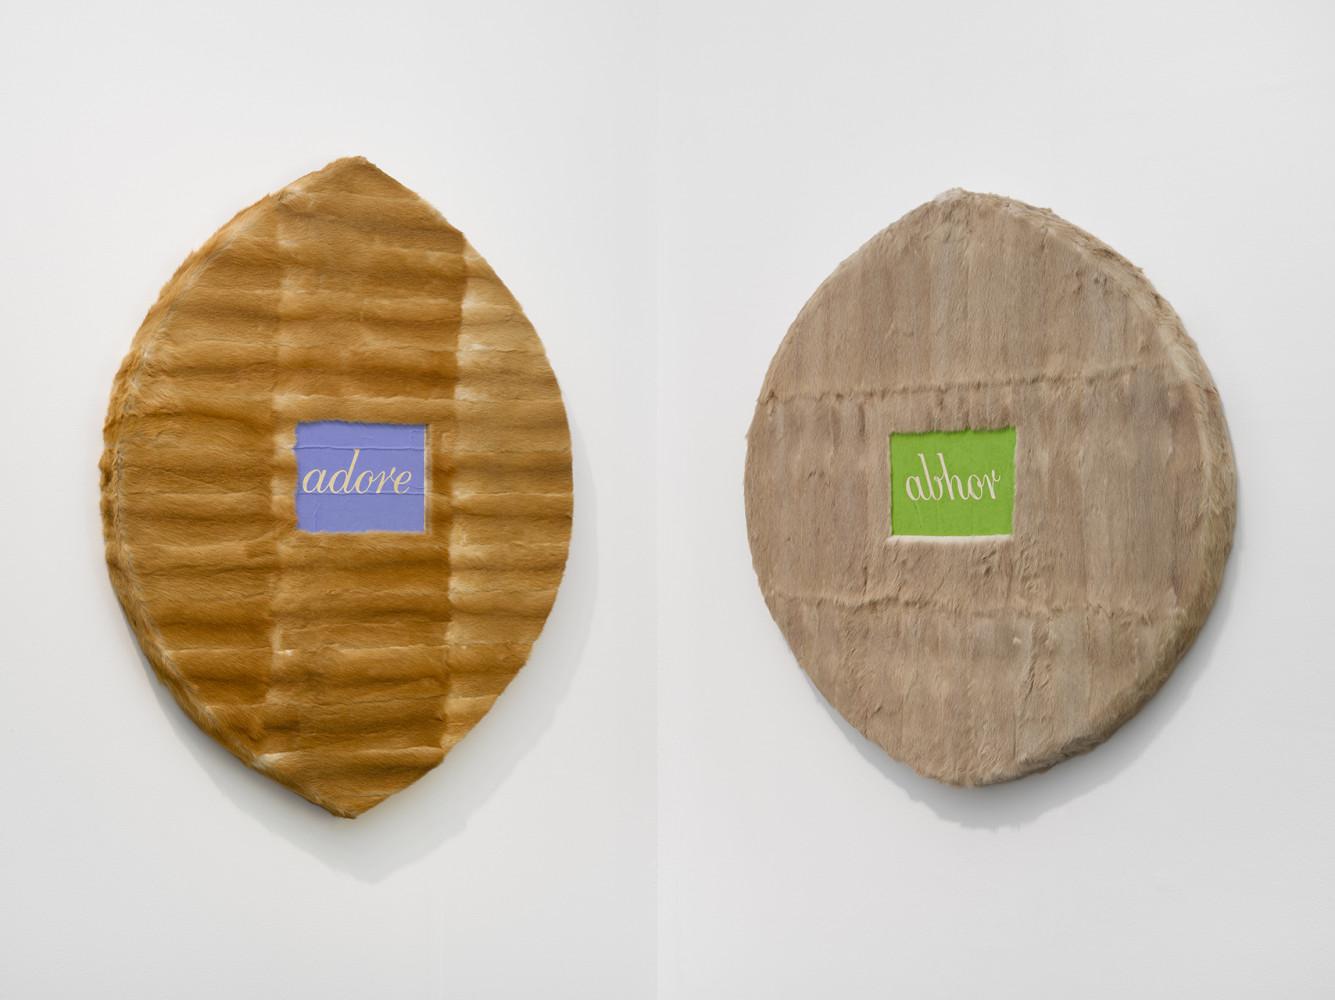 <div class=&#34;artist&#34;><strong>Helen CHADWICK</strong></div> 1953 - 1996 <div class=&#34;title&#34;><em>Adore; Abhor</em>, 1994</div> <div class=&#34;medium&#34;>Oil on fur, plywood, MDF, on two panels</div> <div class=&#34;dimensions&#34;>2 panels; 100 x 110 cm and 116 x 93 cm</div> <div class=&#34;edition_details&#34;>Unique</div>